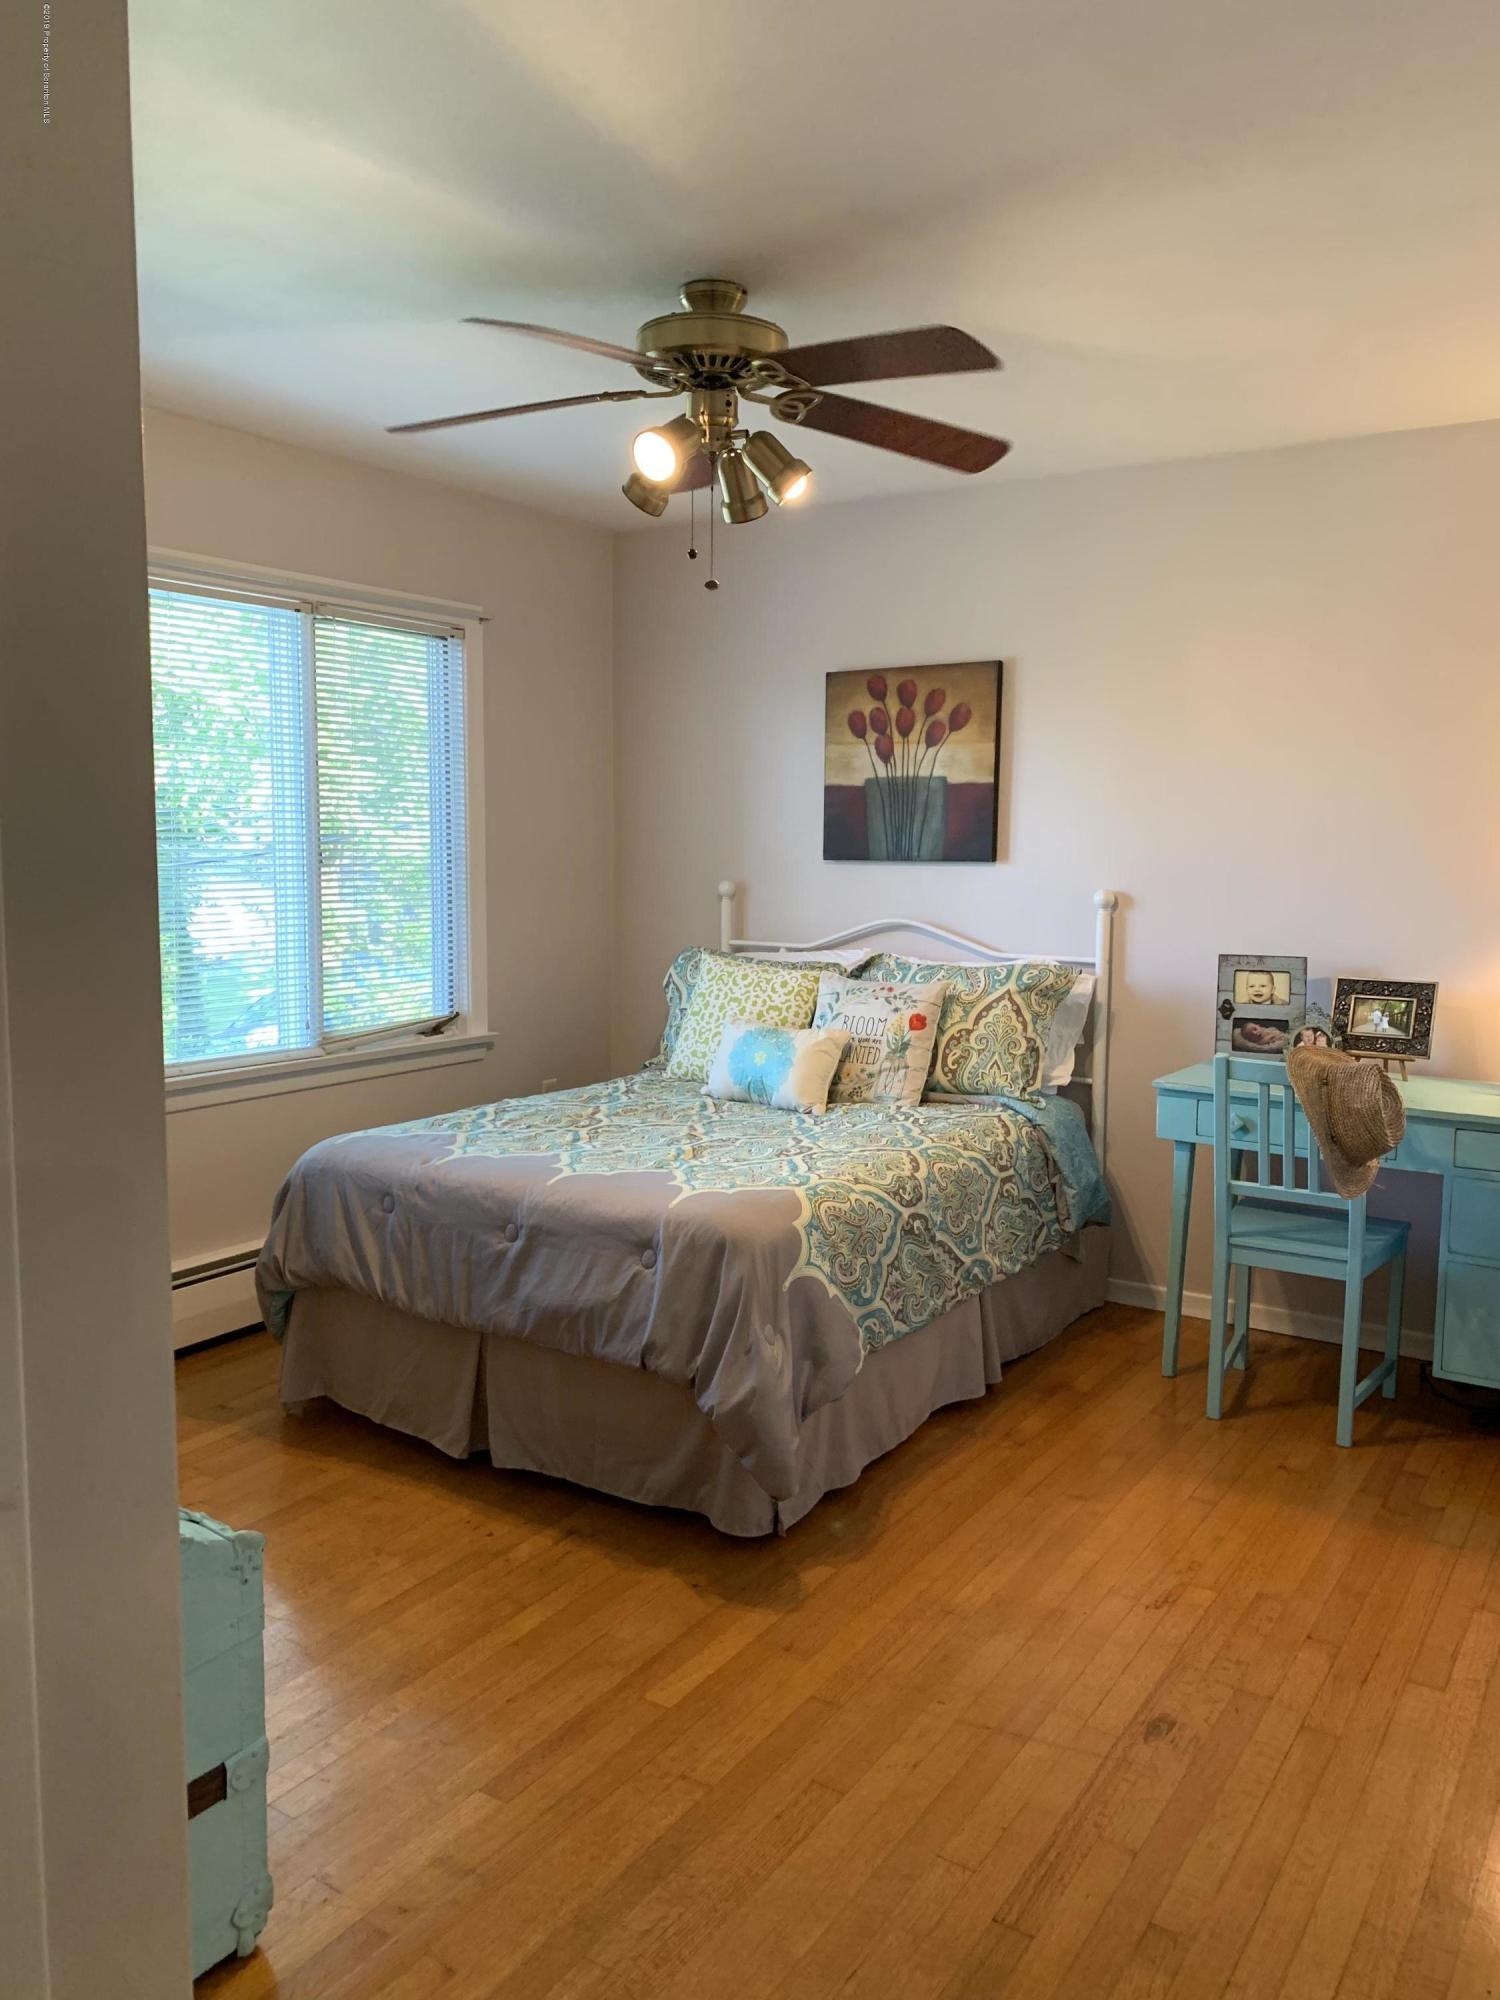 104 Grandview St, Clarks Summit, Pennsylvania 18411, 4 Bedrooms Bedrooms, 8 Rooms Rooms,3 BathroomsBathrooms,Single Family,For Sale,Grandview,19-3950